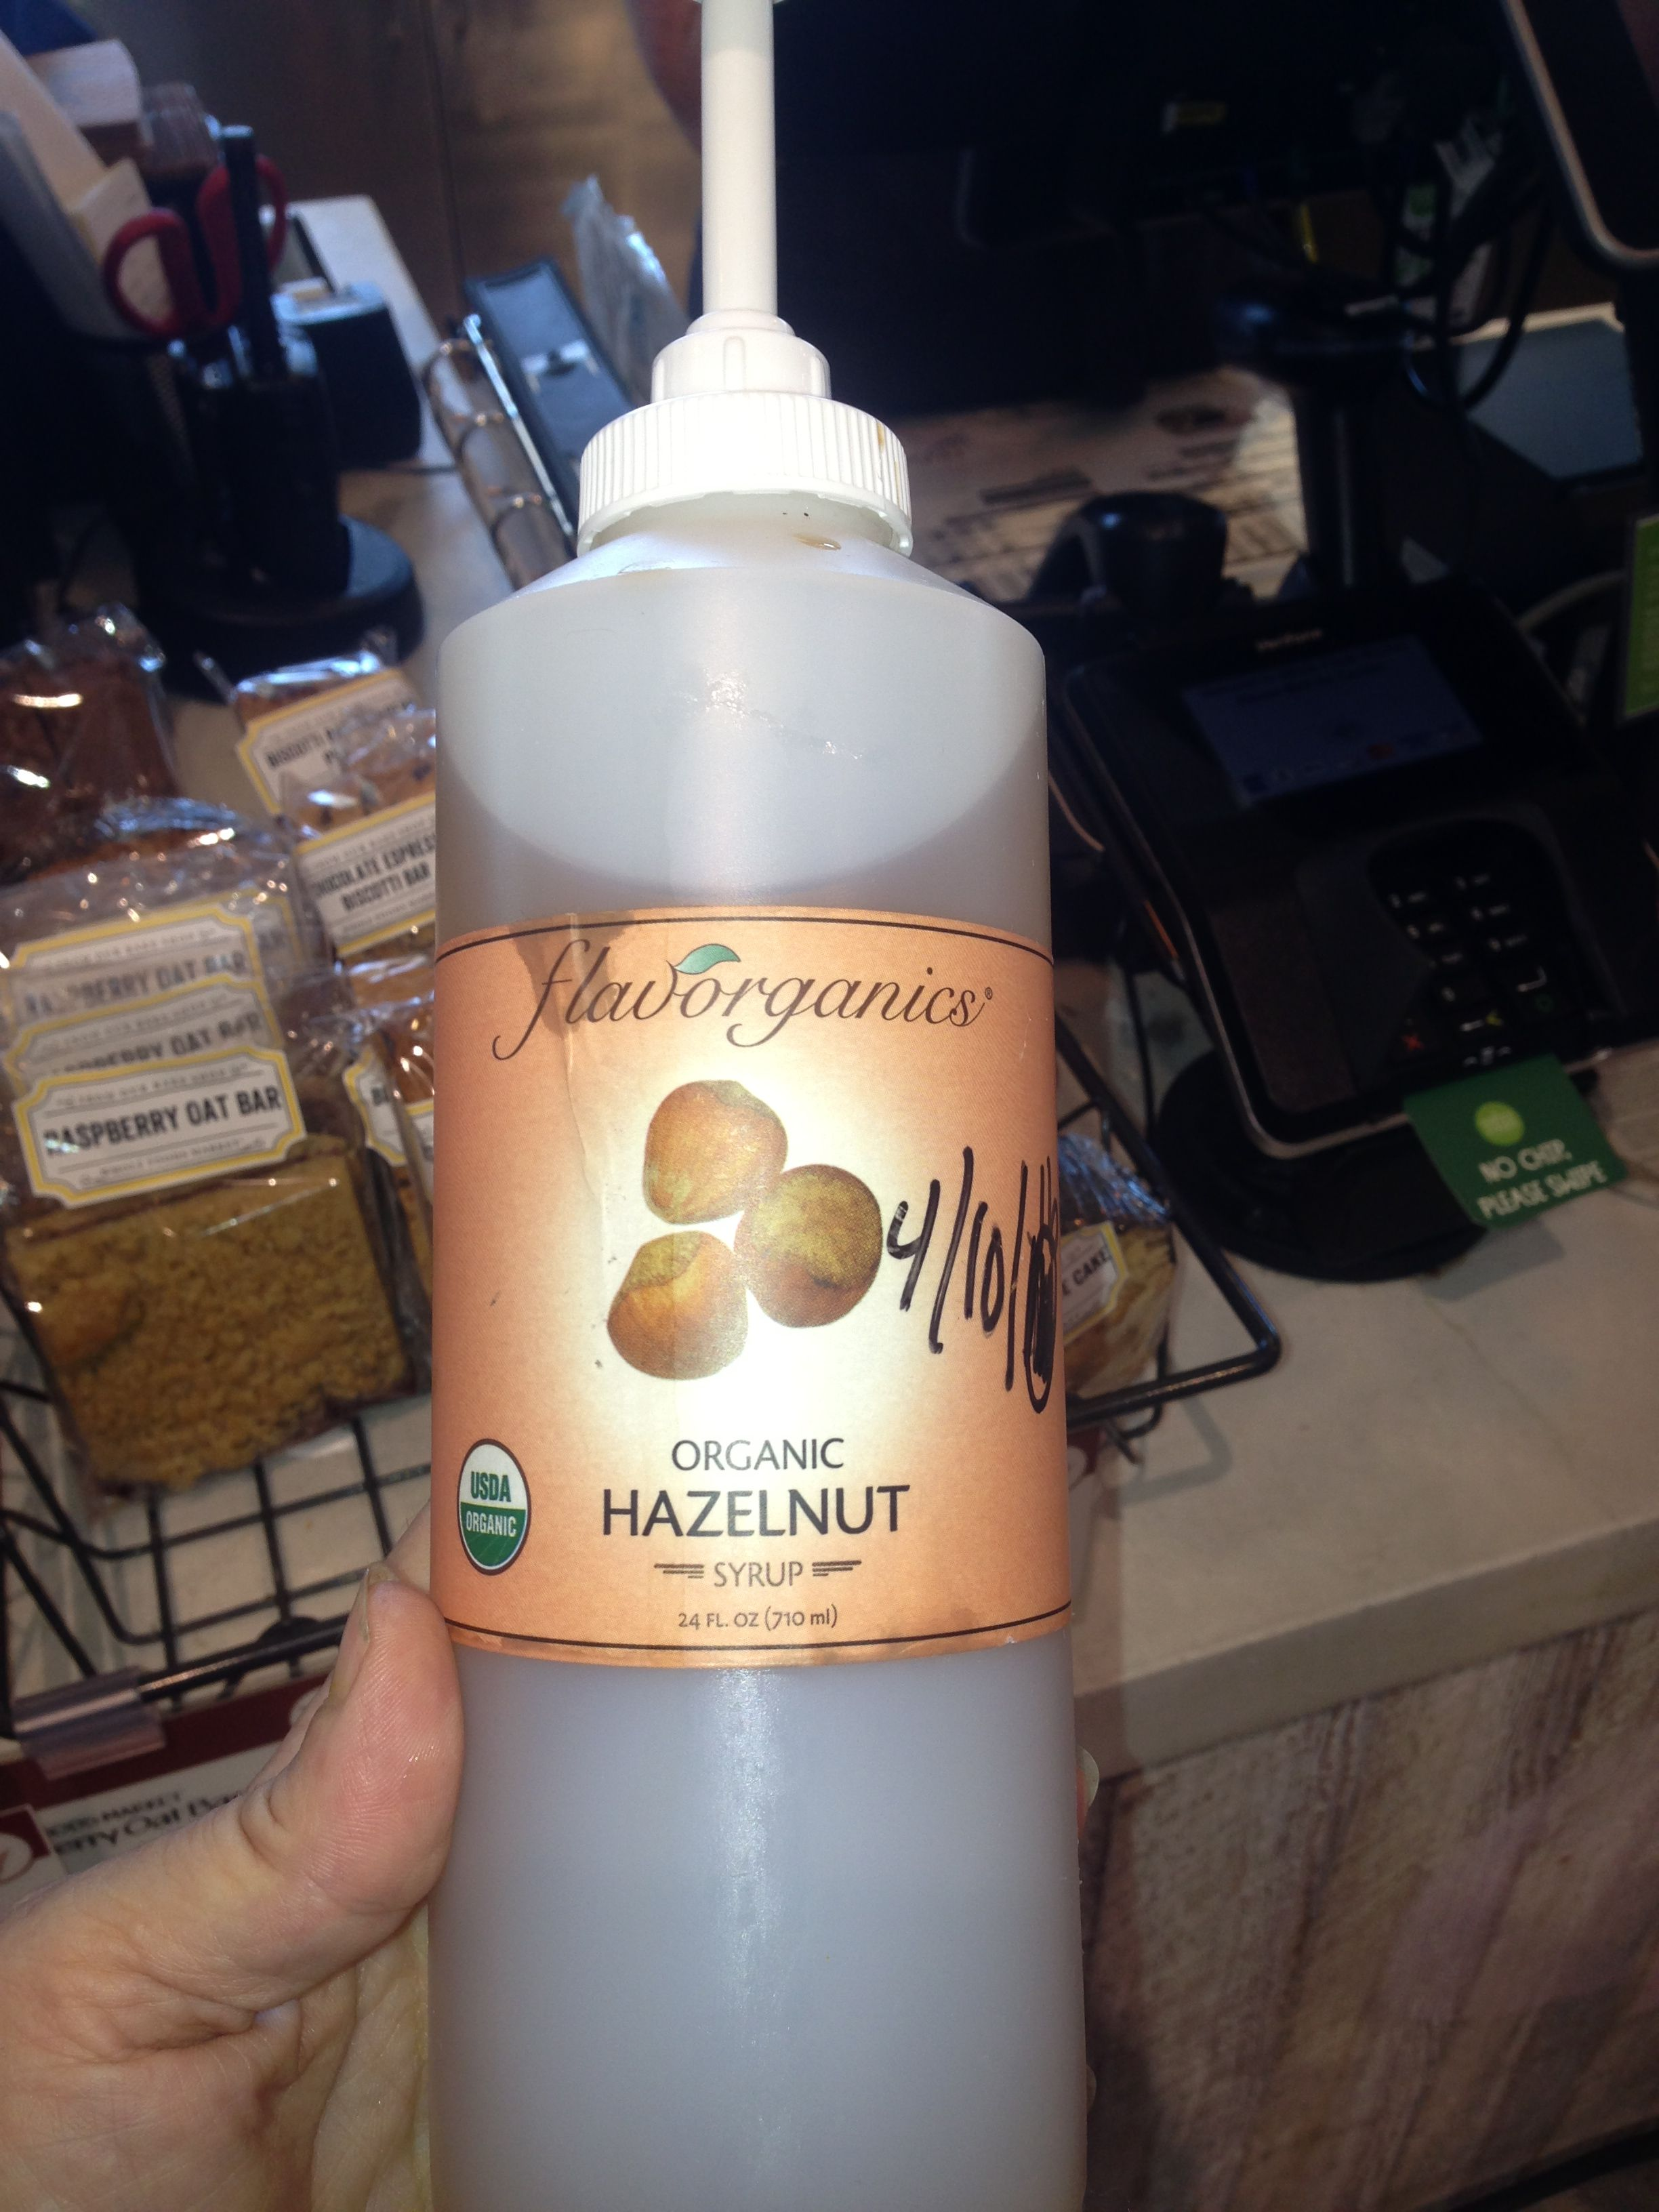 Flavorganics syrups